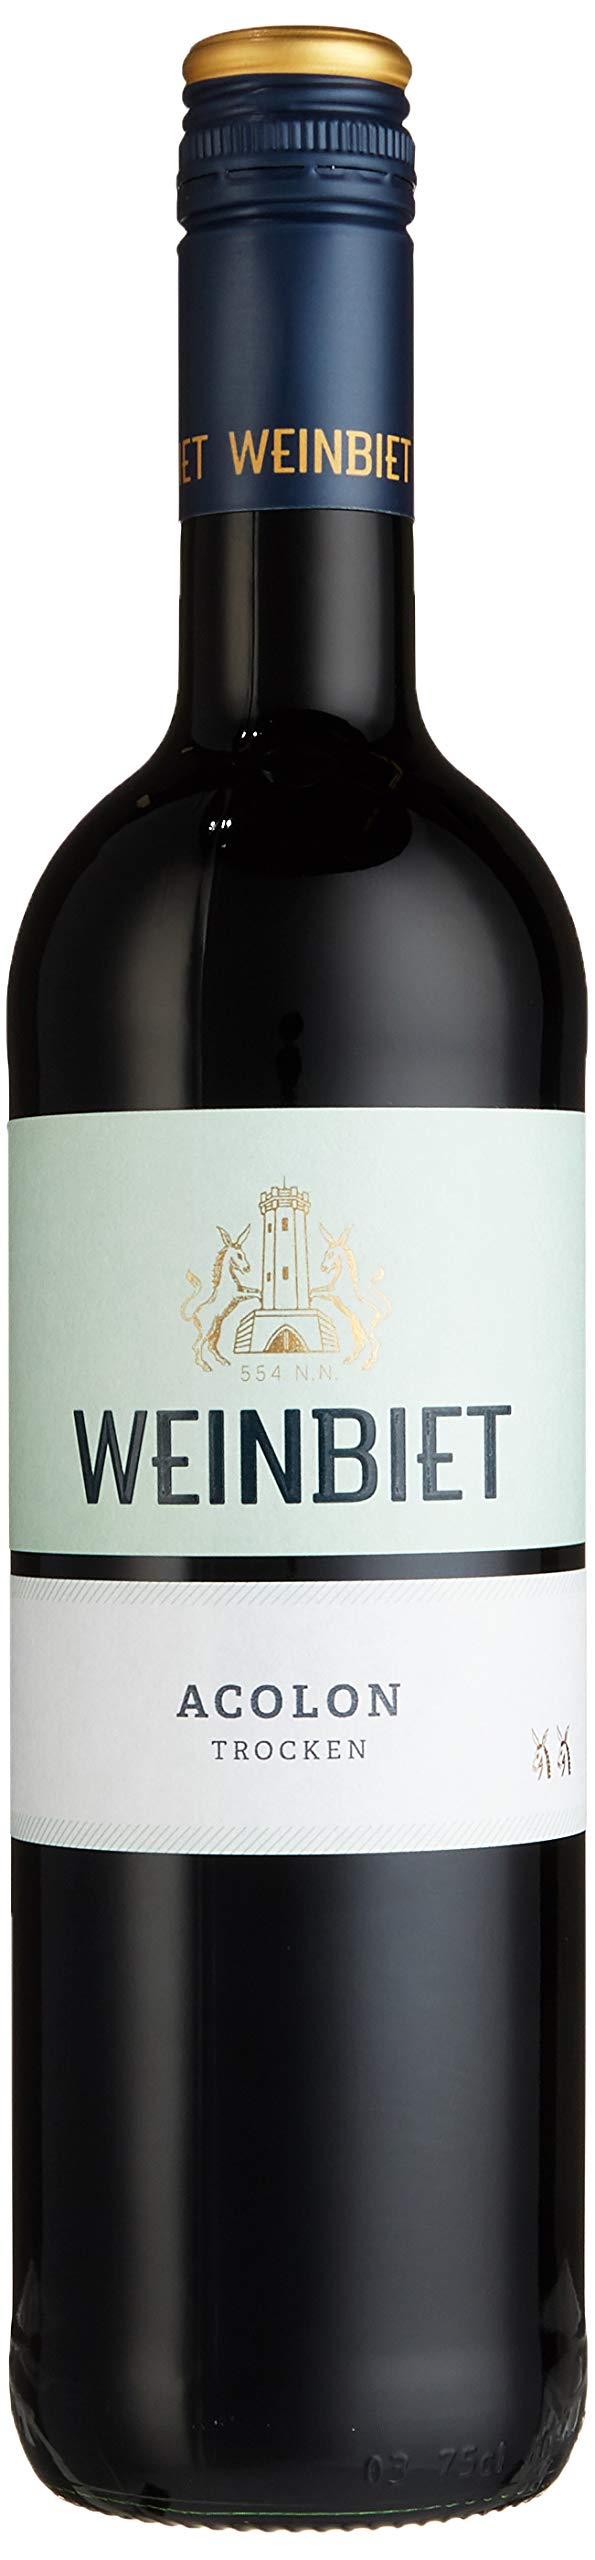 Weinbiet-Manufaktur-Acolon-2017-Trocken-6-x-075-l